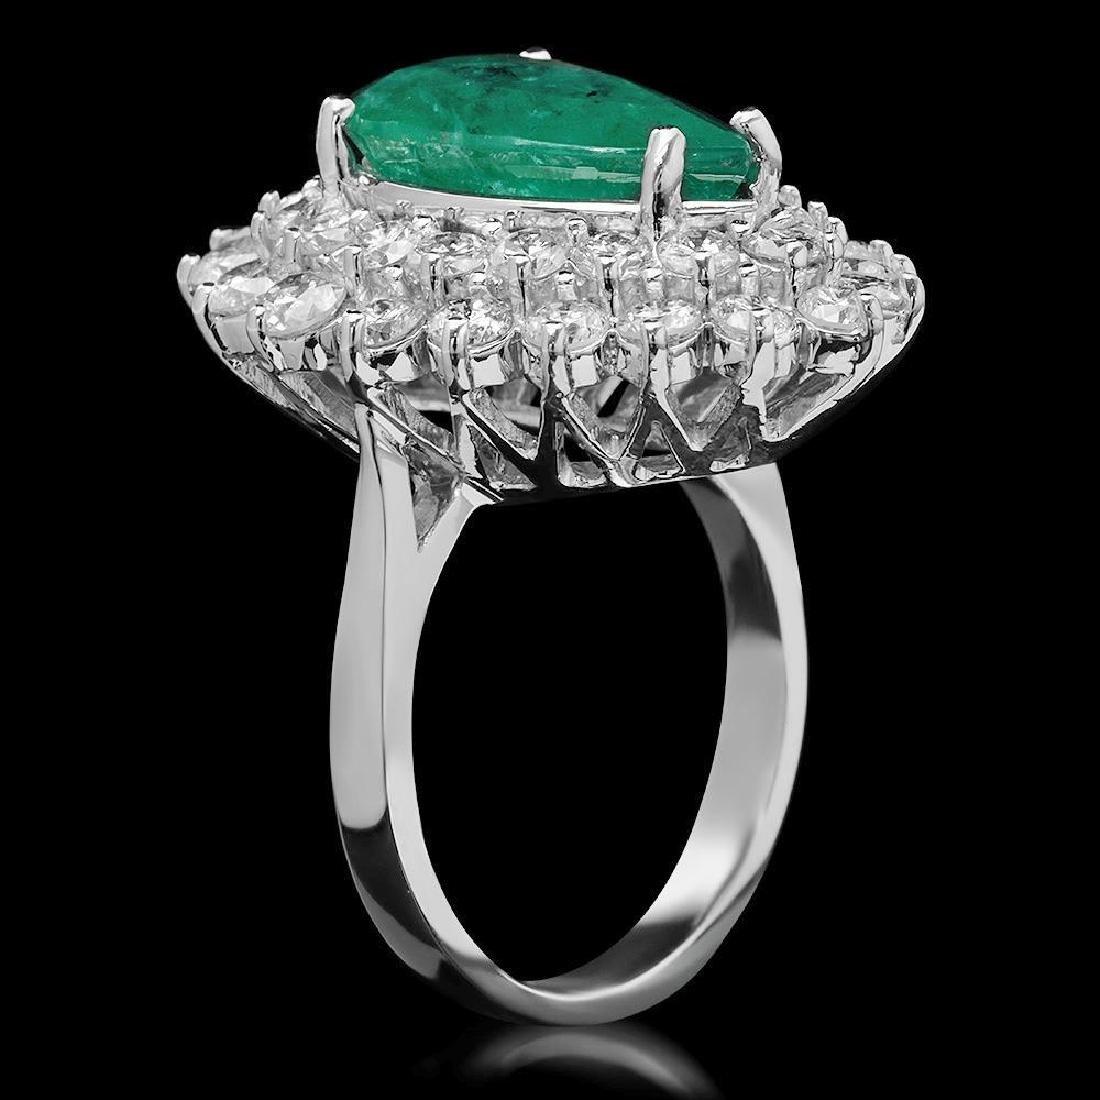 14K Gold 5.12ct Emerald & 2.75ct Diamond Ring - 2